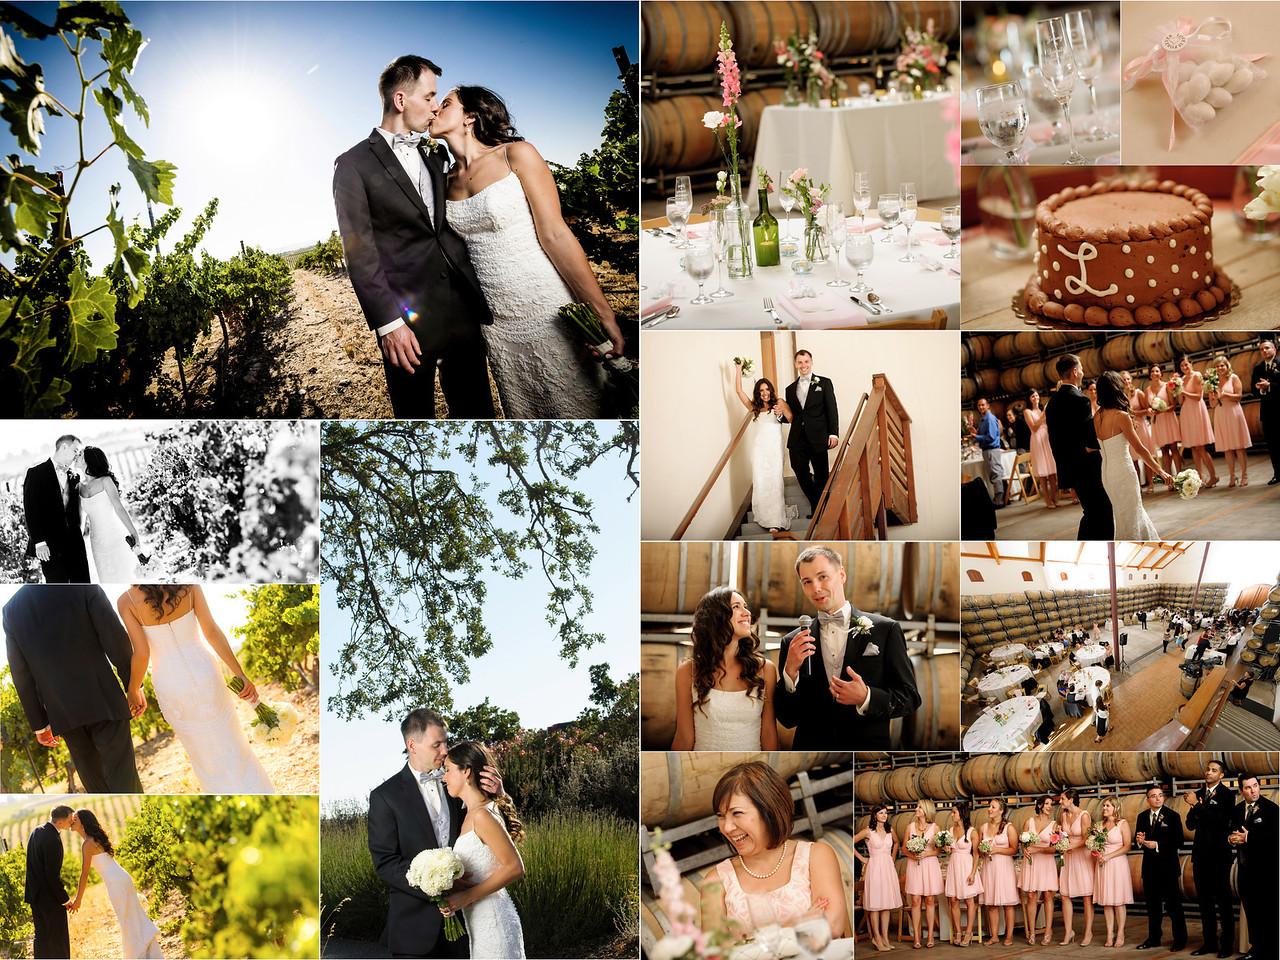 Jenny_and_Dimitriy_Wedding_Photography_4x6_Photo_Board_06